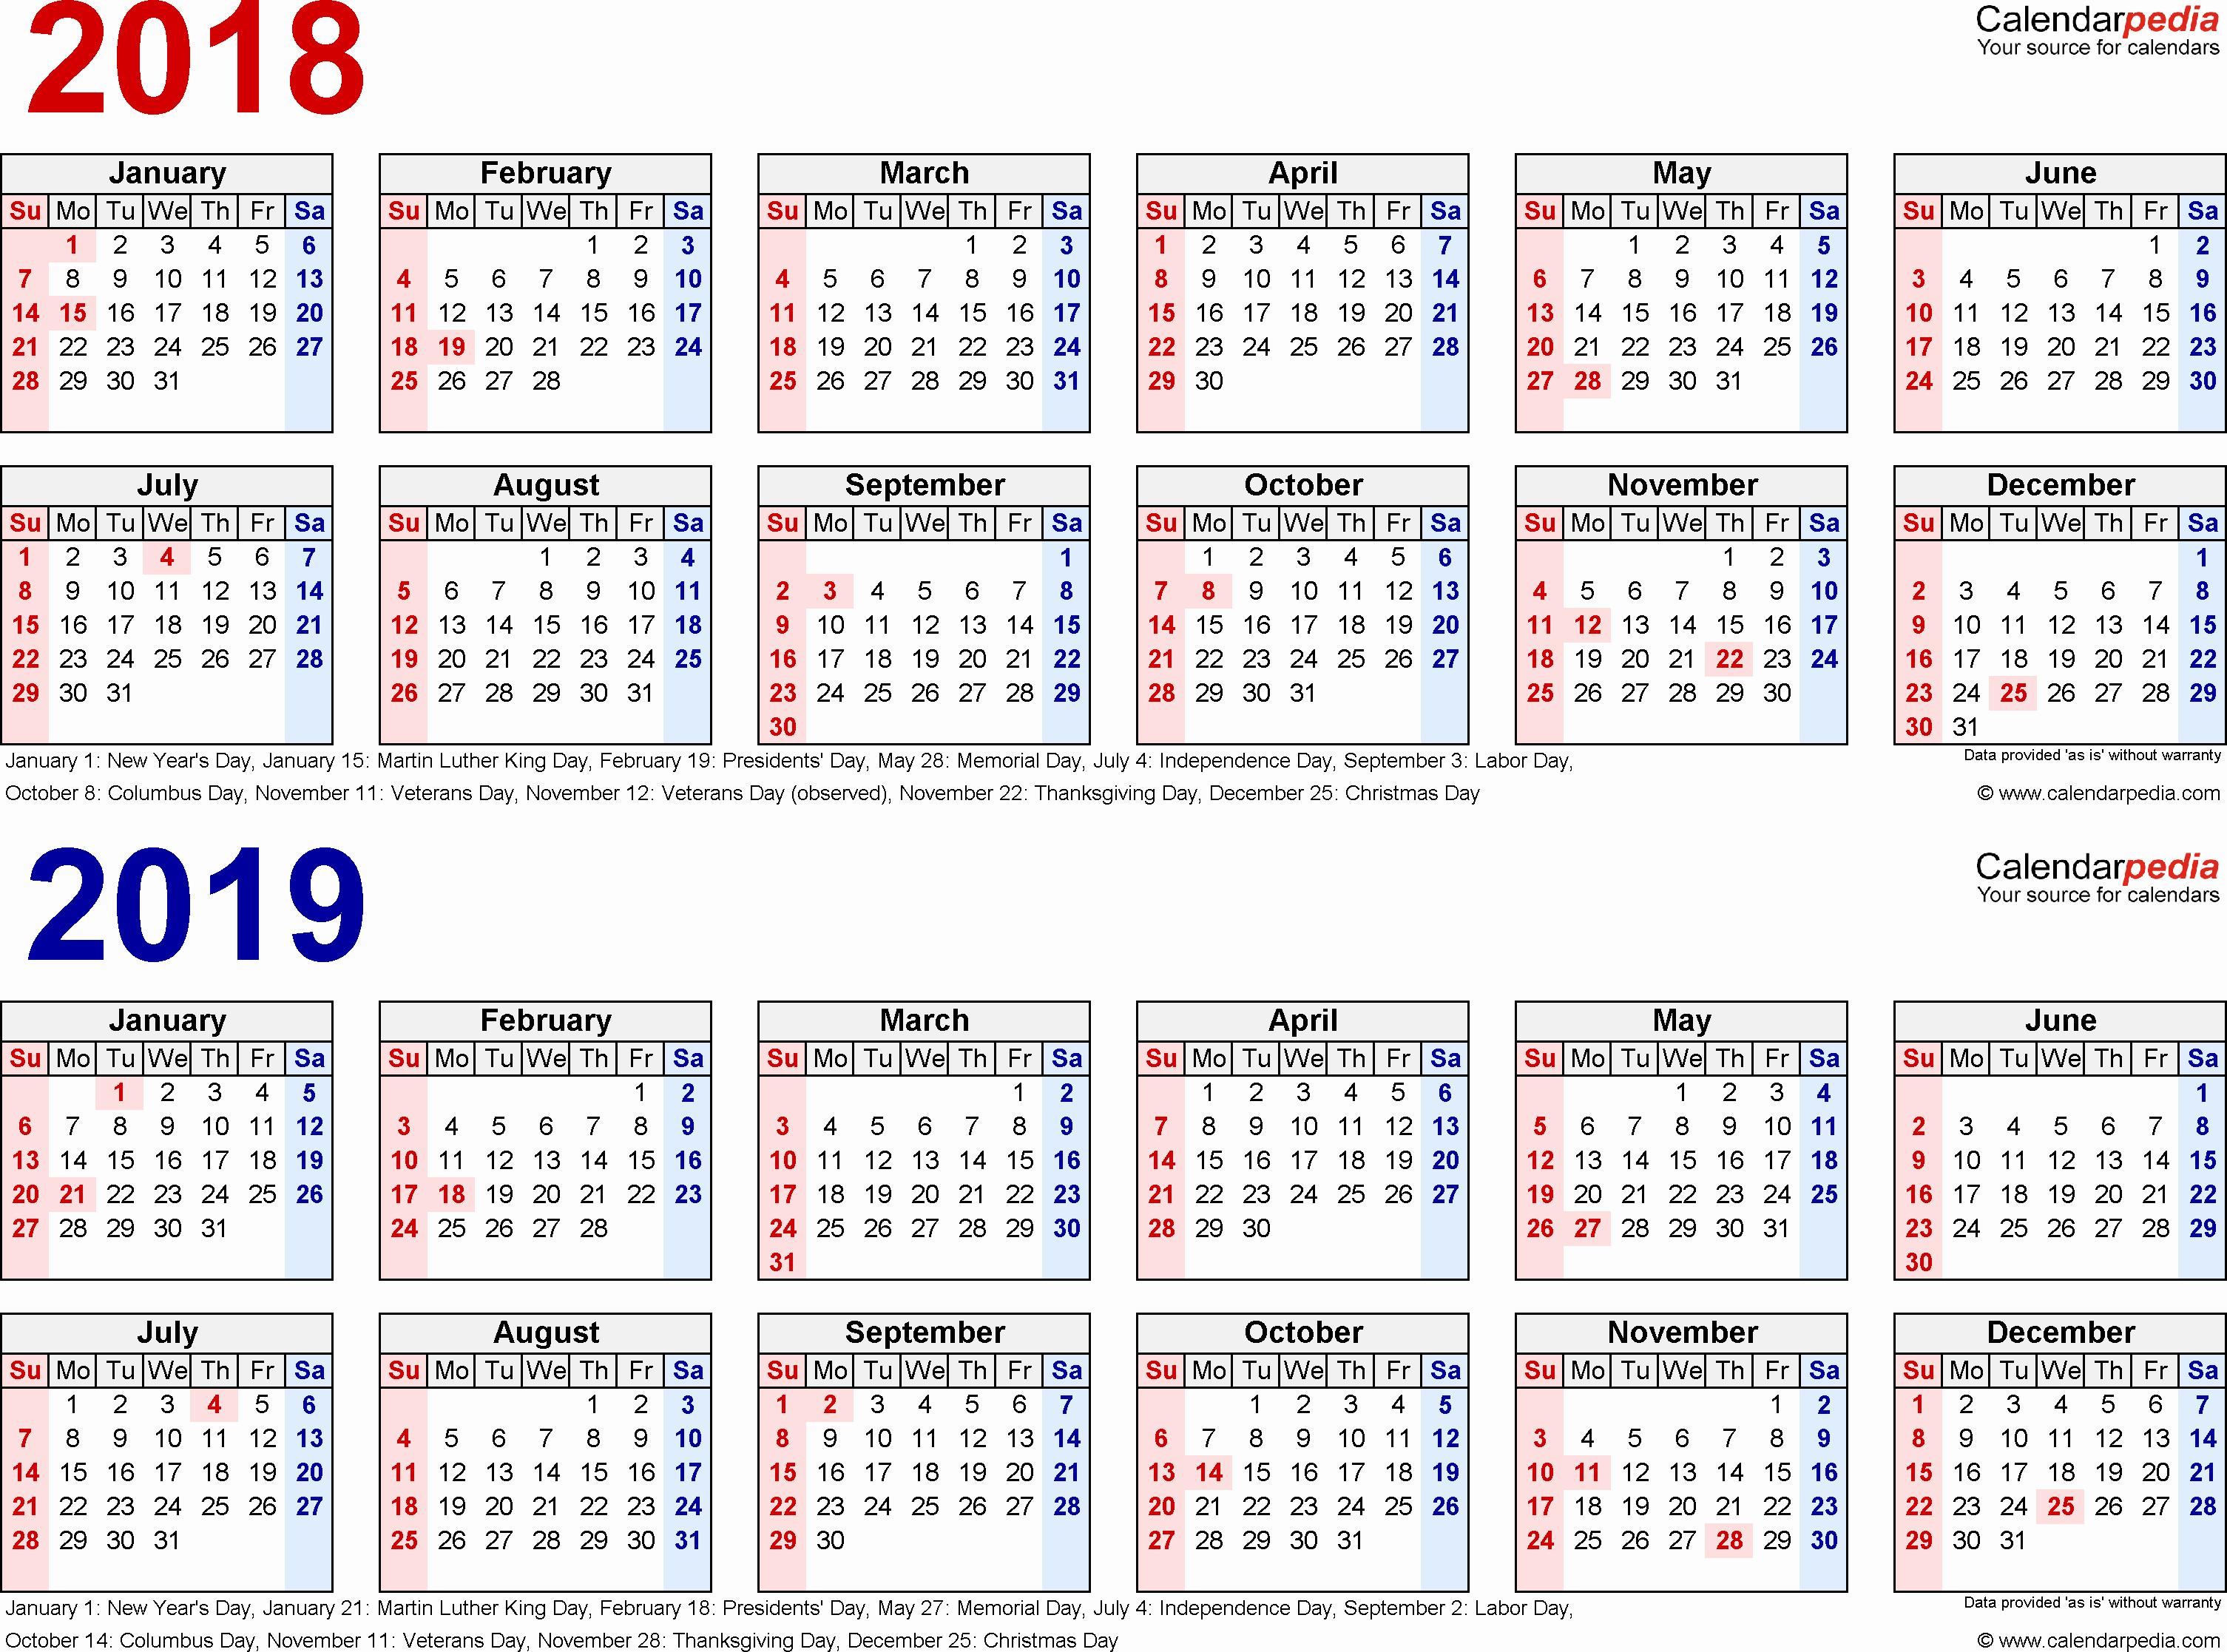 2018 and 2019 Printable Calendar Fresh 2018 2019 Calendar Free Printable Two Year Pdf Calendars